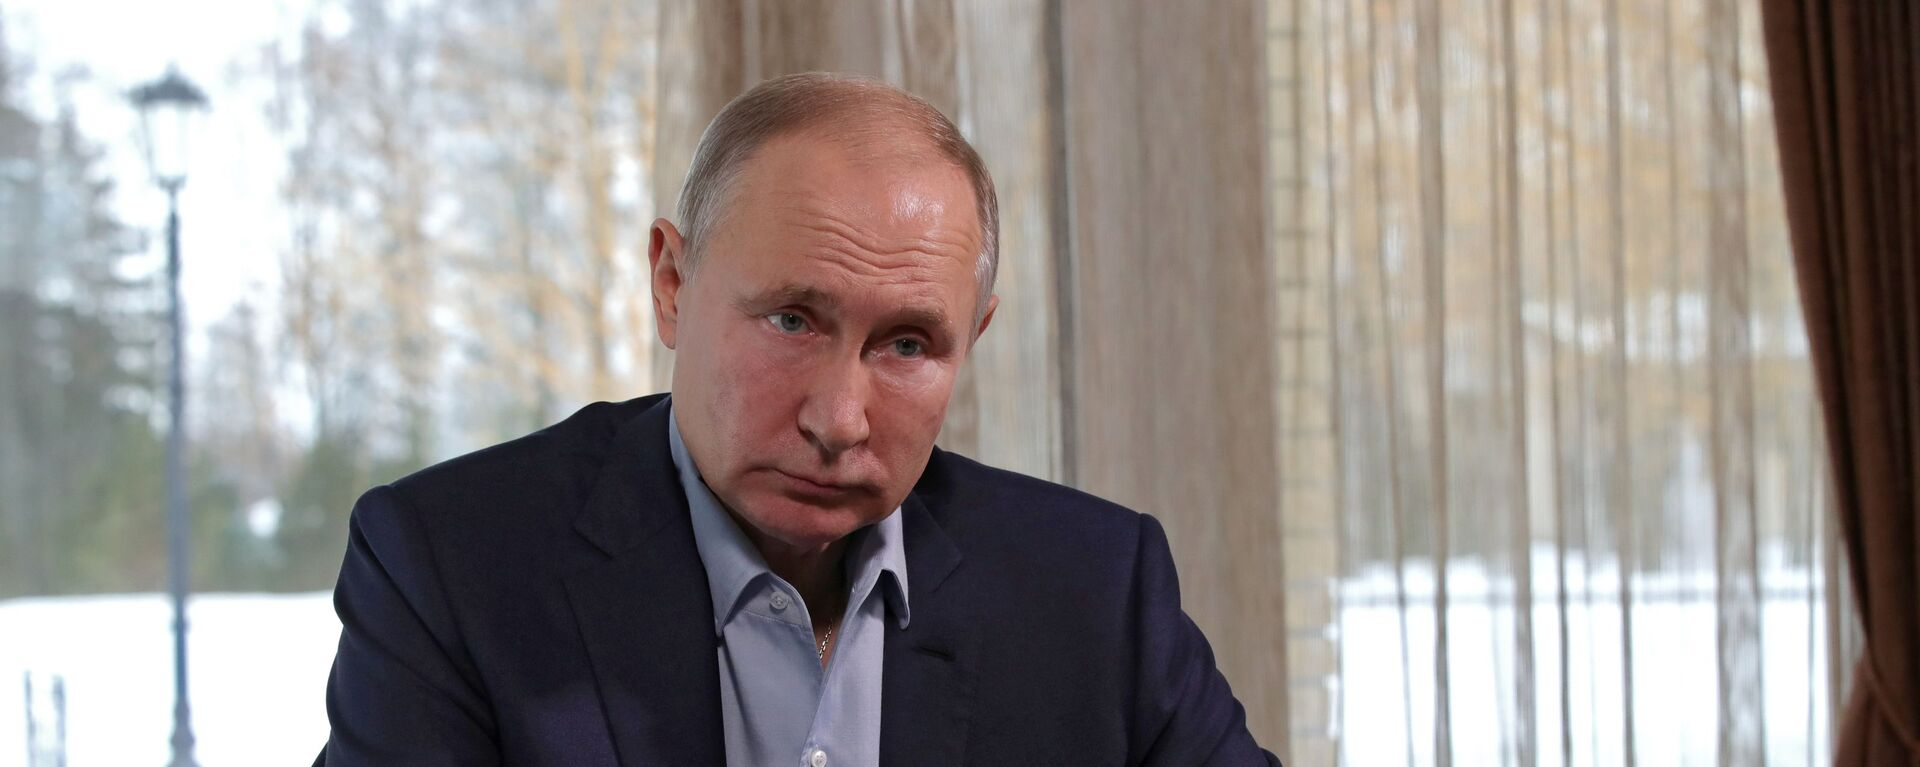 Vladímir Putin, presidente de Rusia - Sputnik Mundo, 1920, 22.03.2021